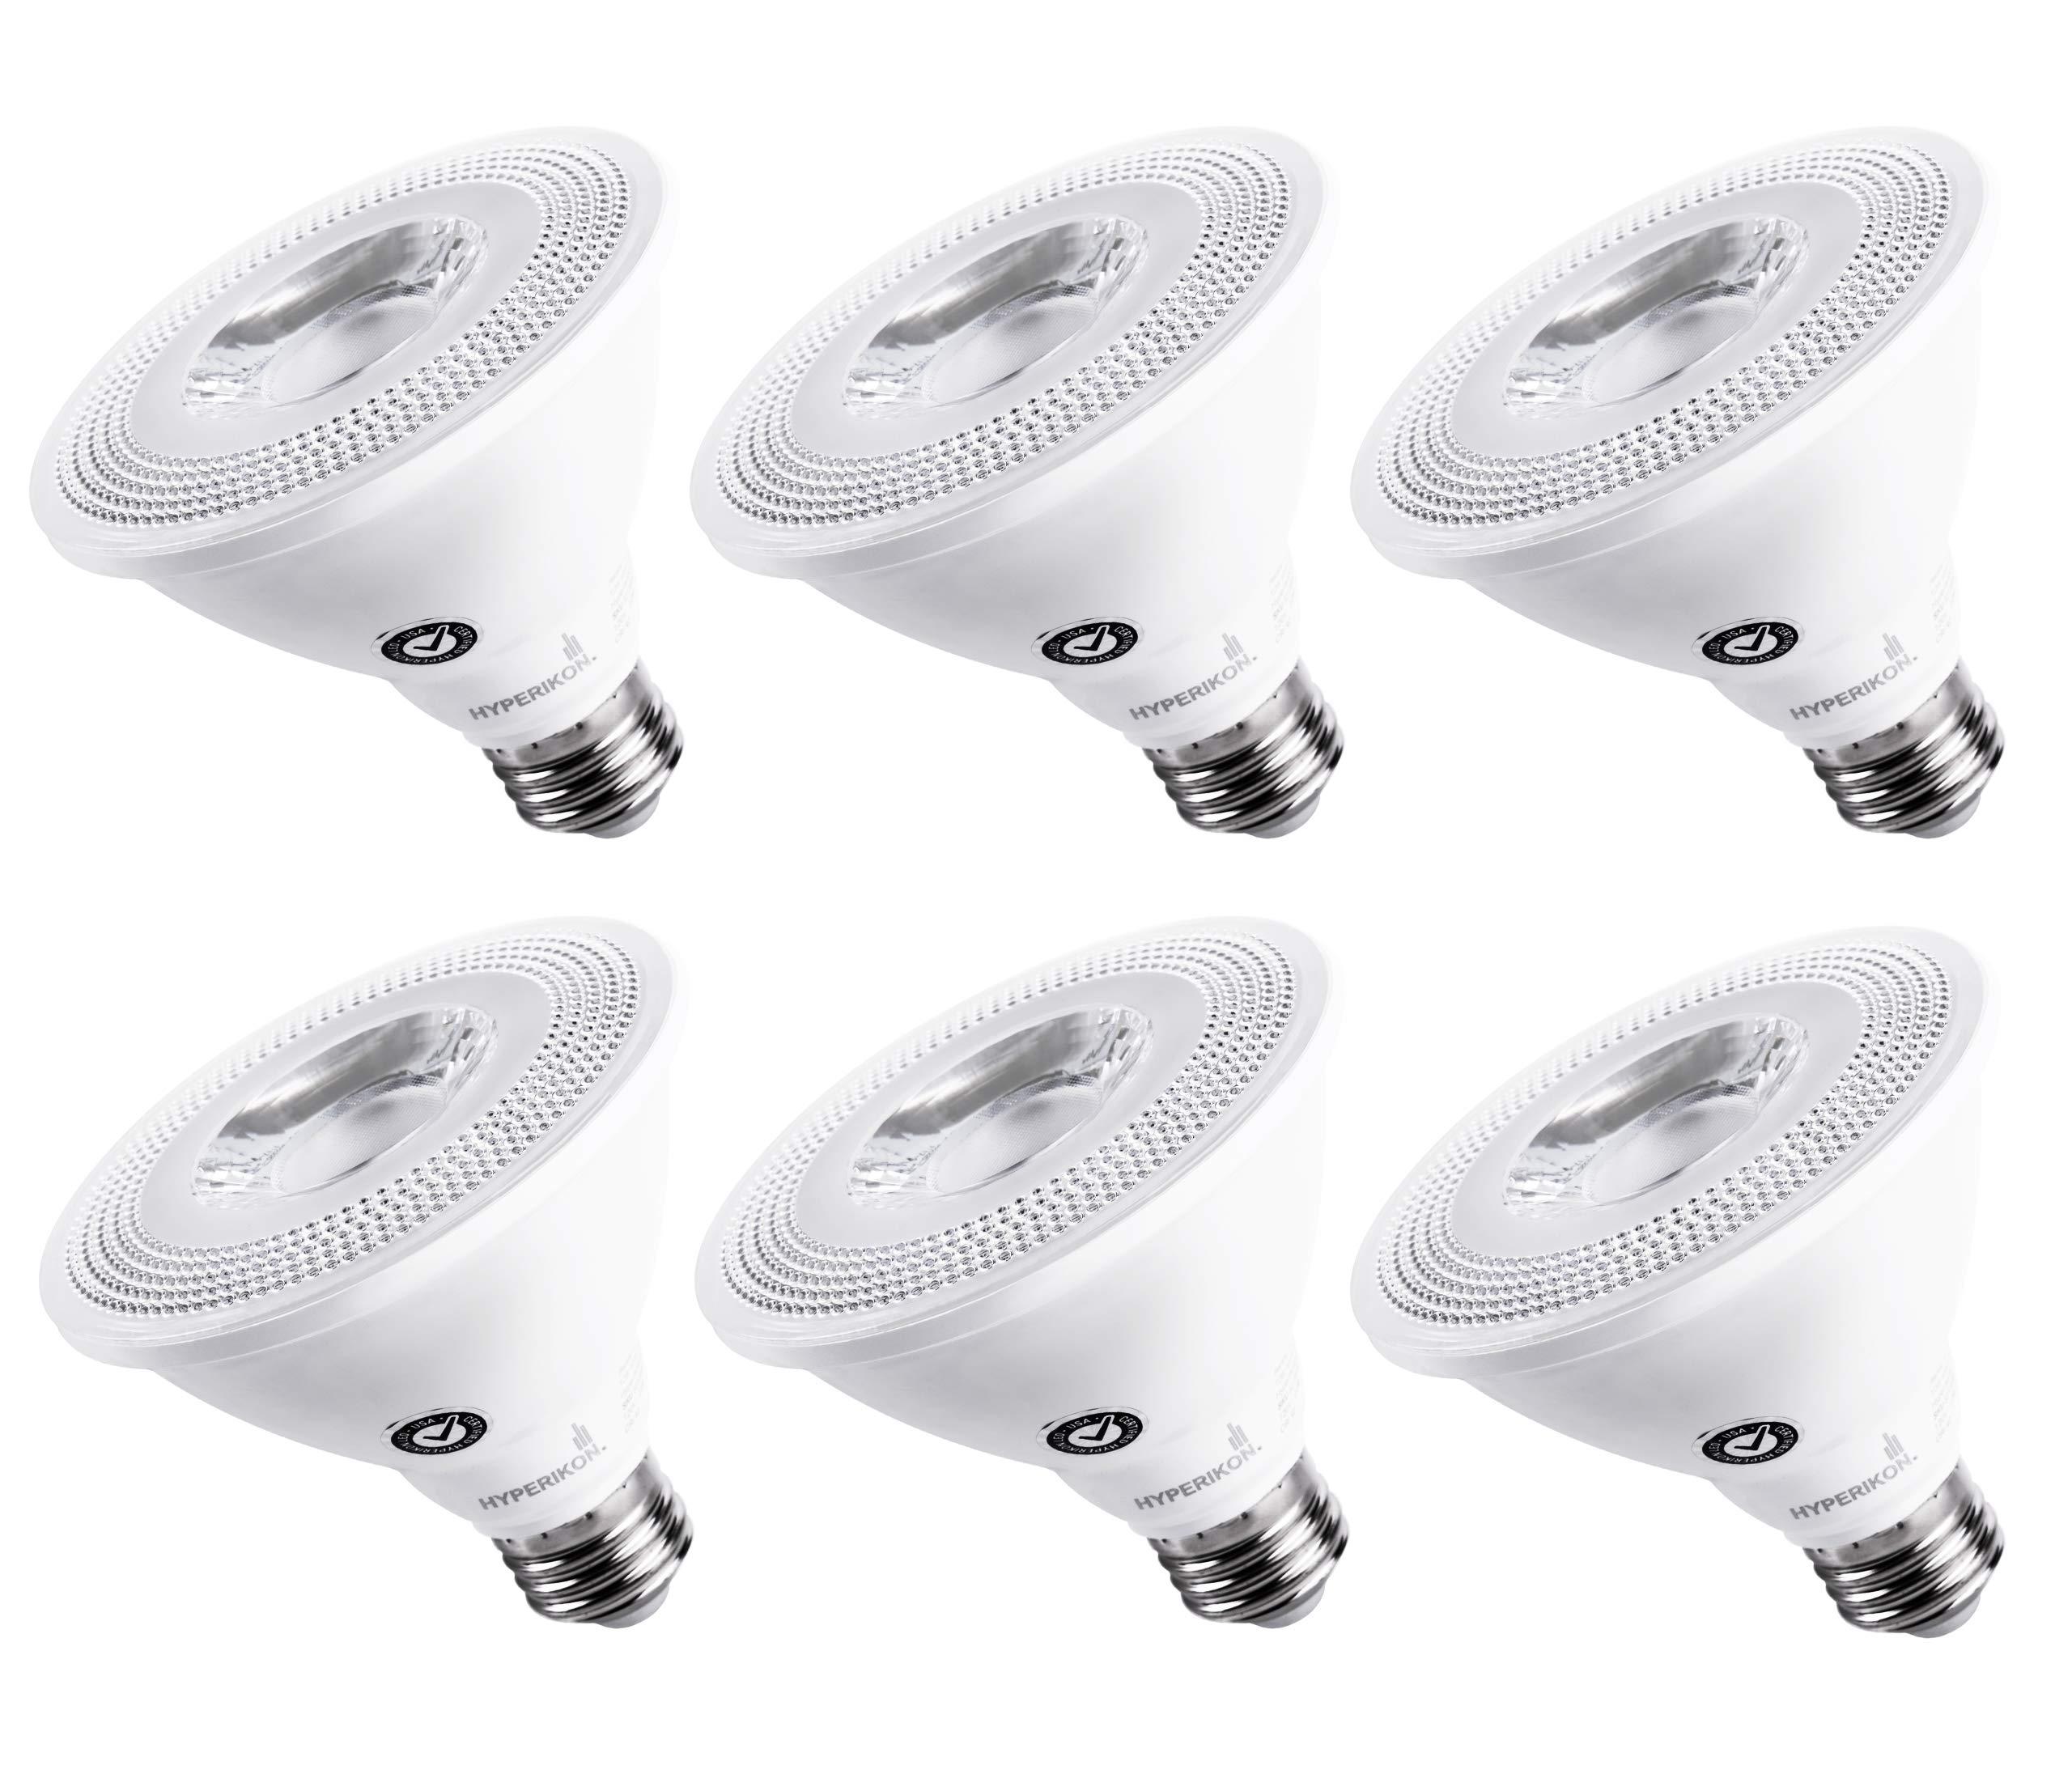 Hyperikon LED PAR30 Bulb, Short Neck 65 Watt (10W), Dimmable Flood Light, E26 Base, 2700K, E26, CRI90, 6 Pack